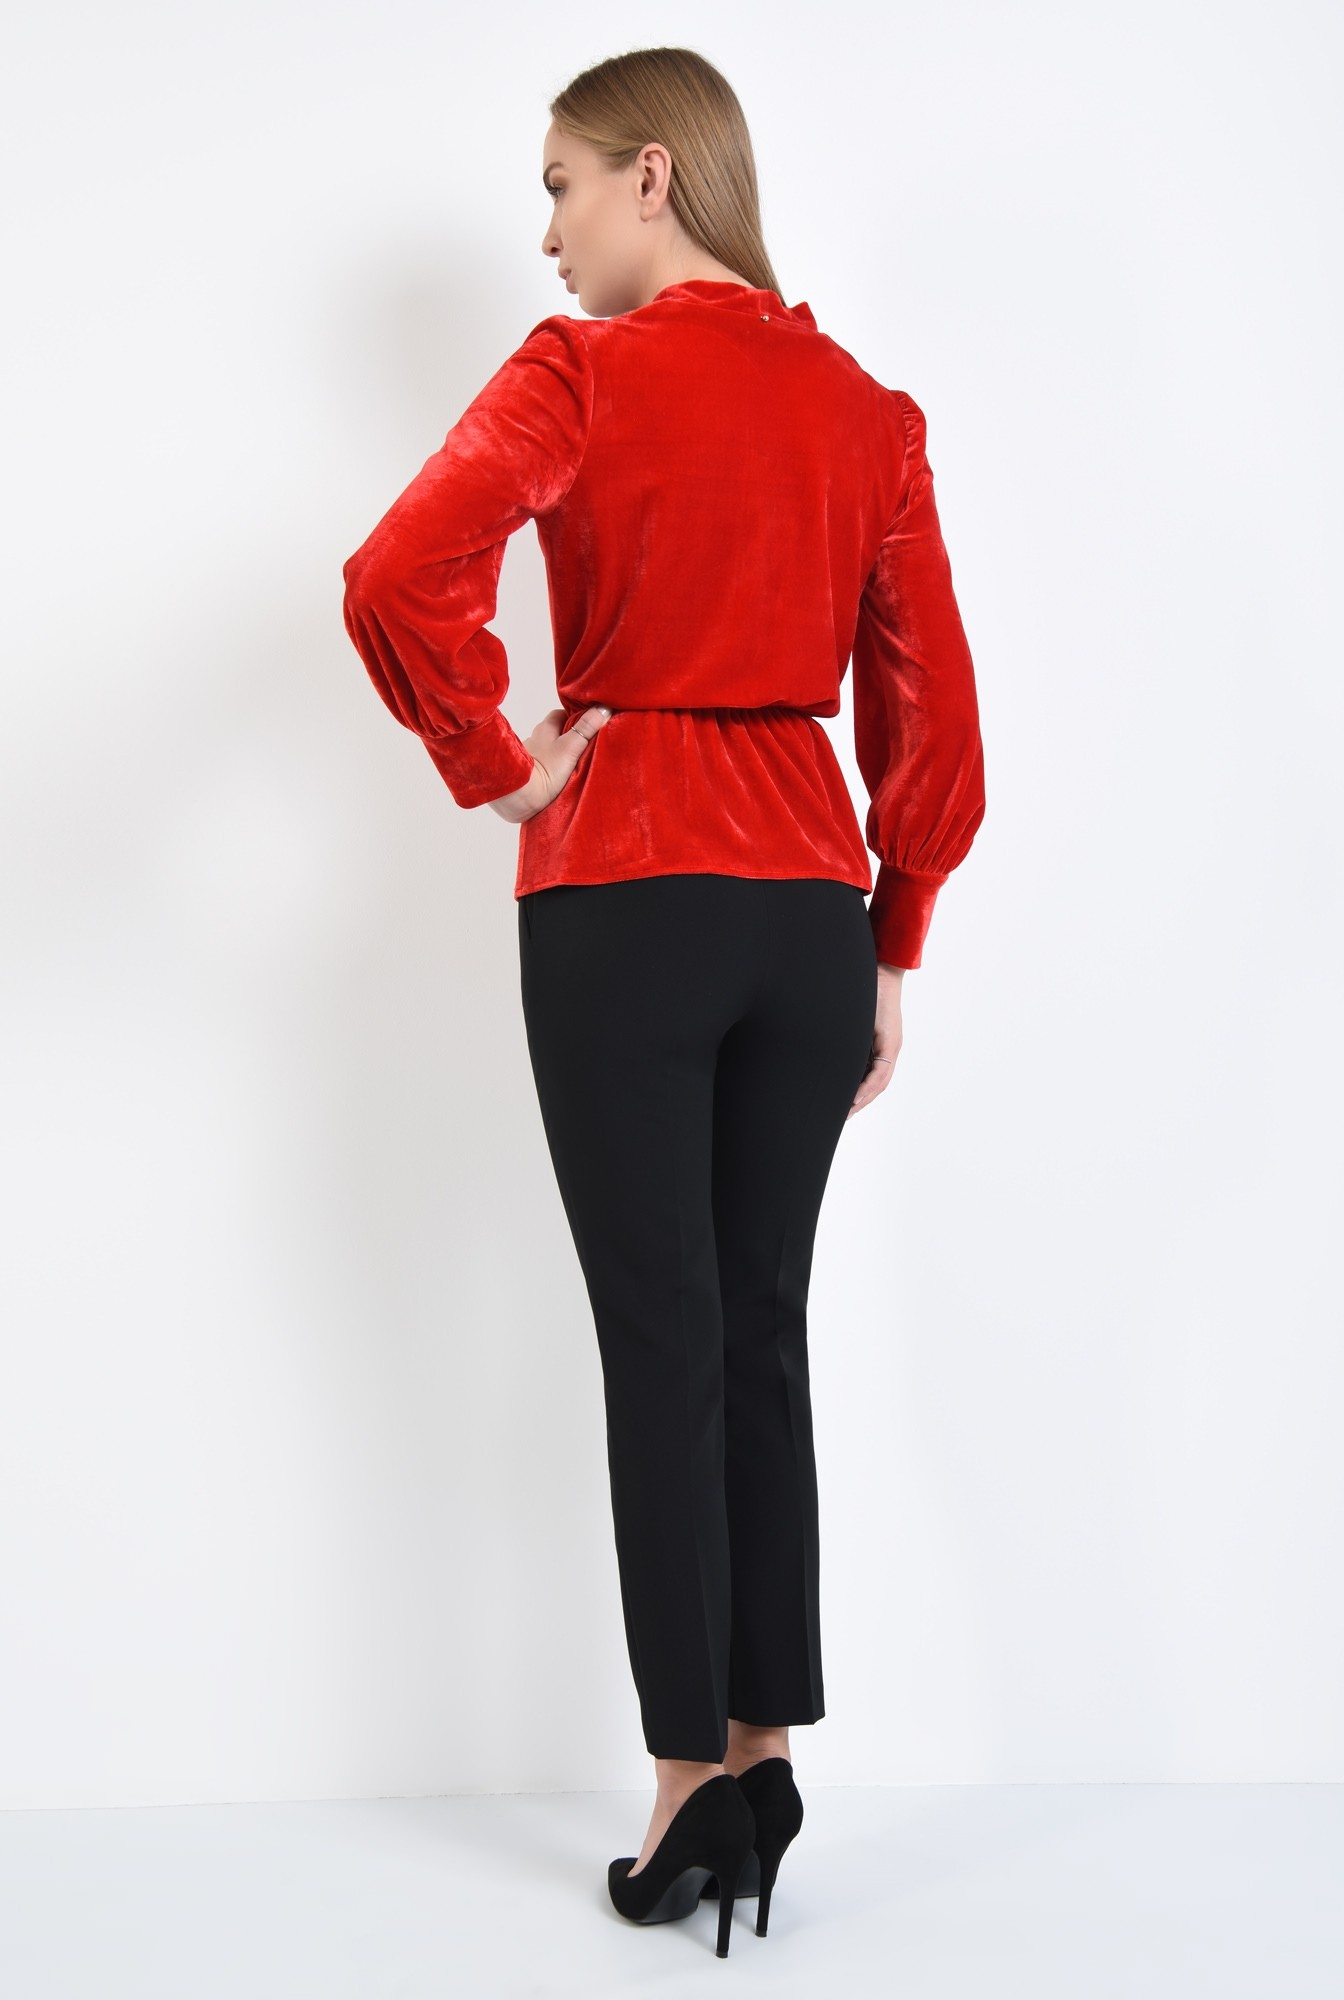 1 - bluza din catifea, rosie, eleganta, bluza dama, online